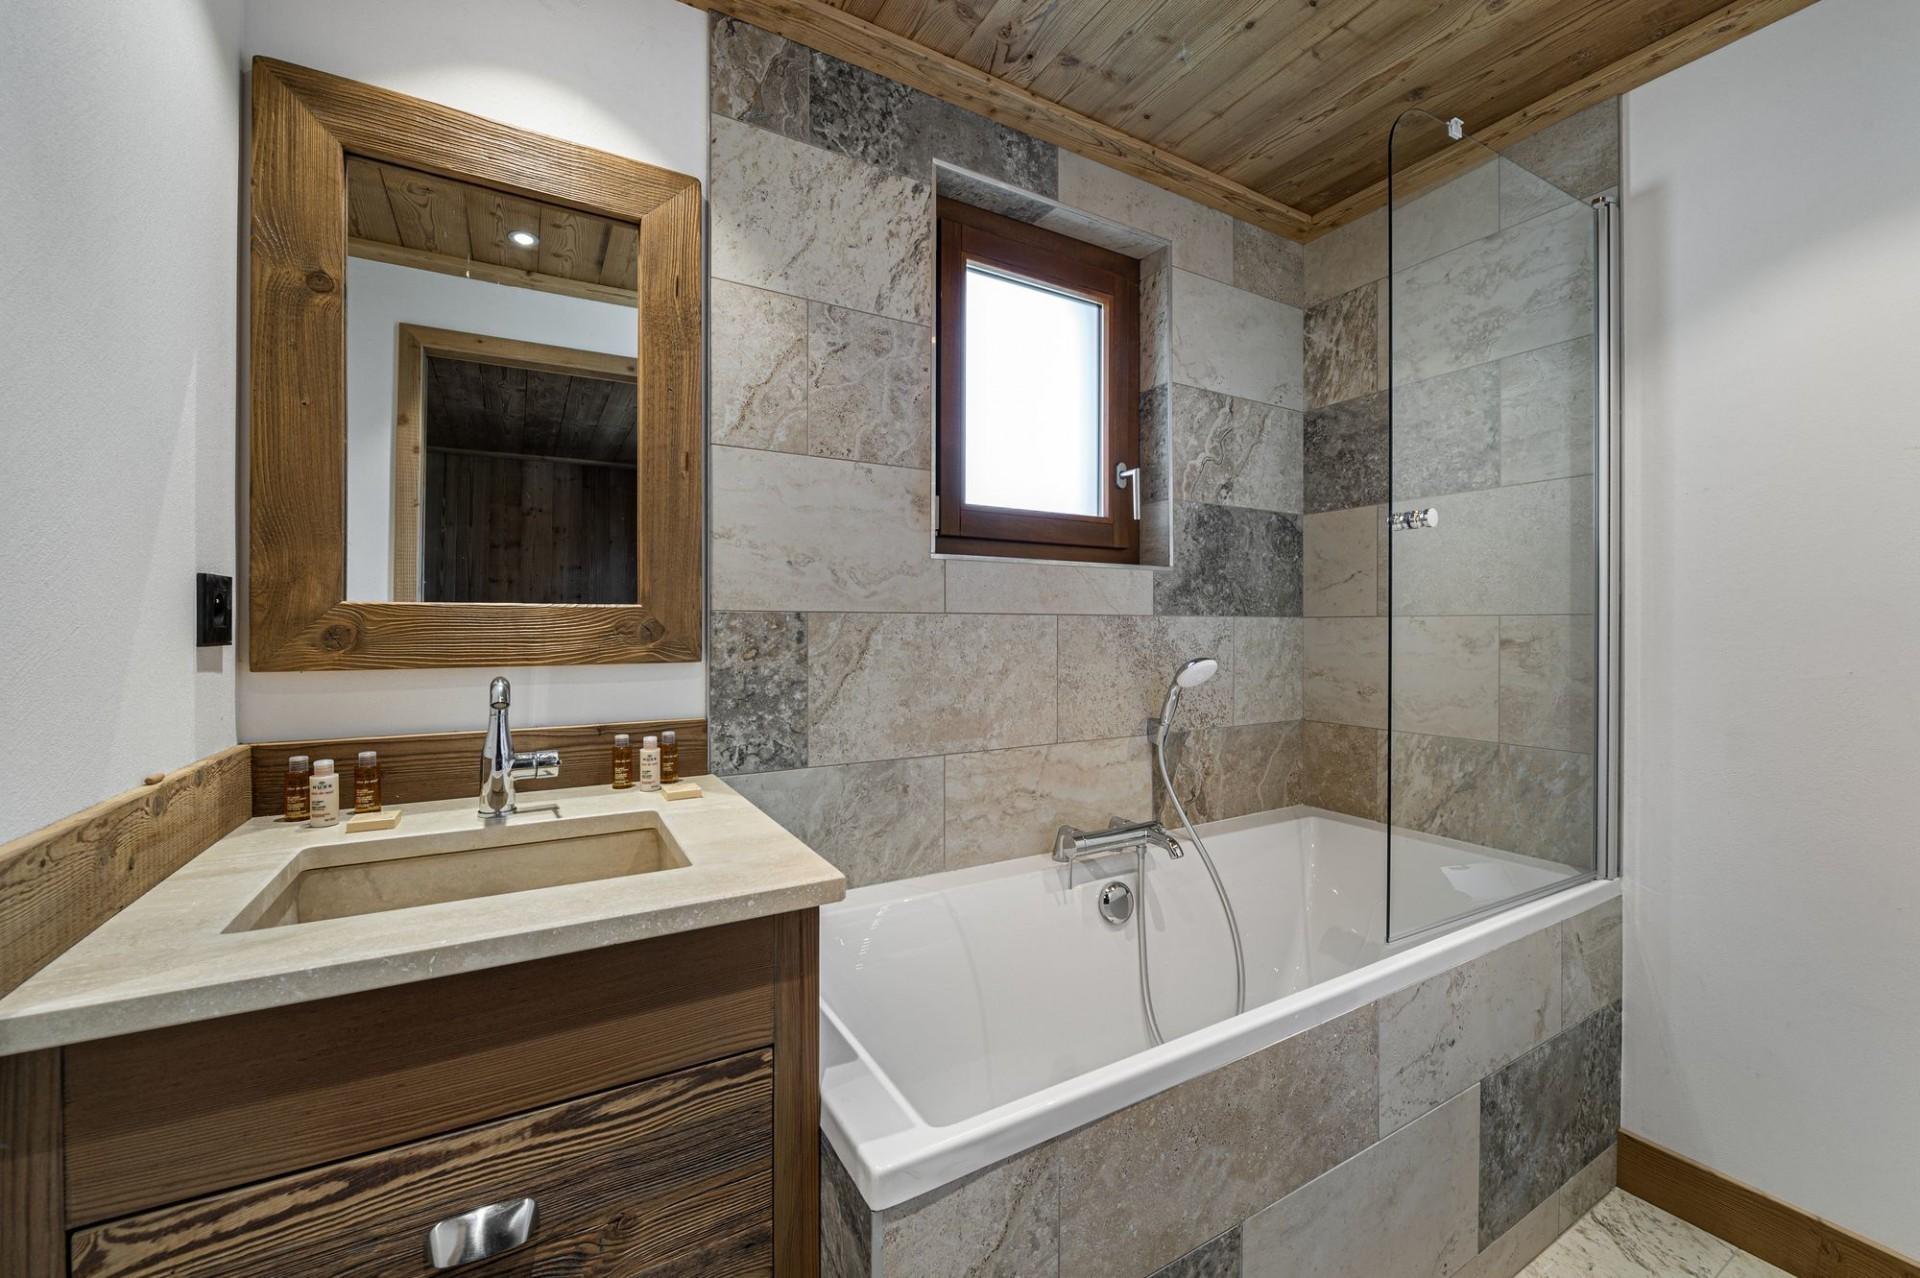 Courchevel 1300 Luxury Rental Appartment Tilite Bathroom 2